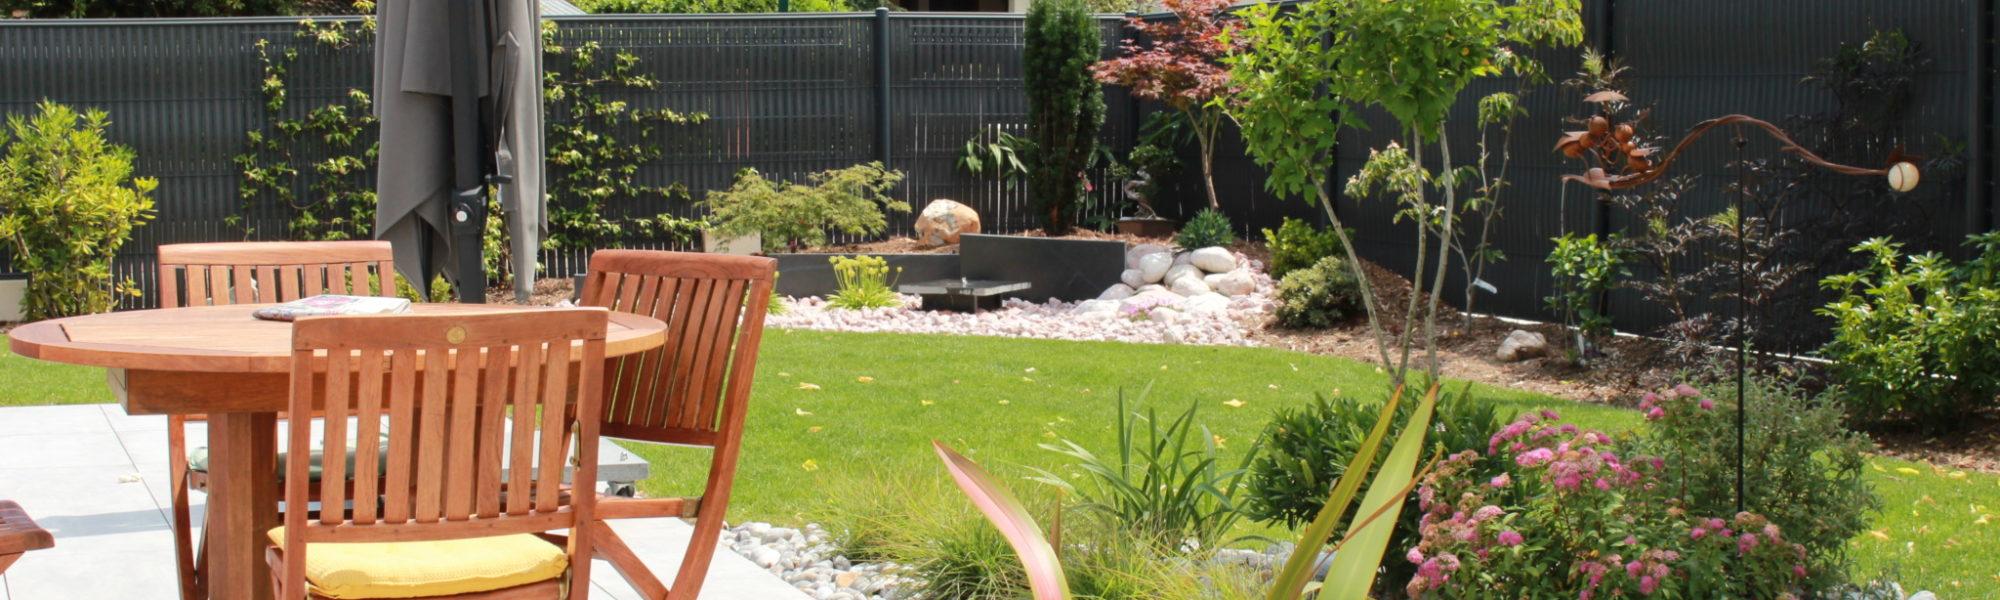 Aménagement de jardin paysagiste